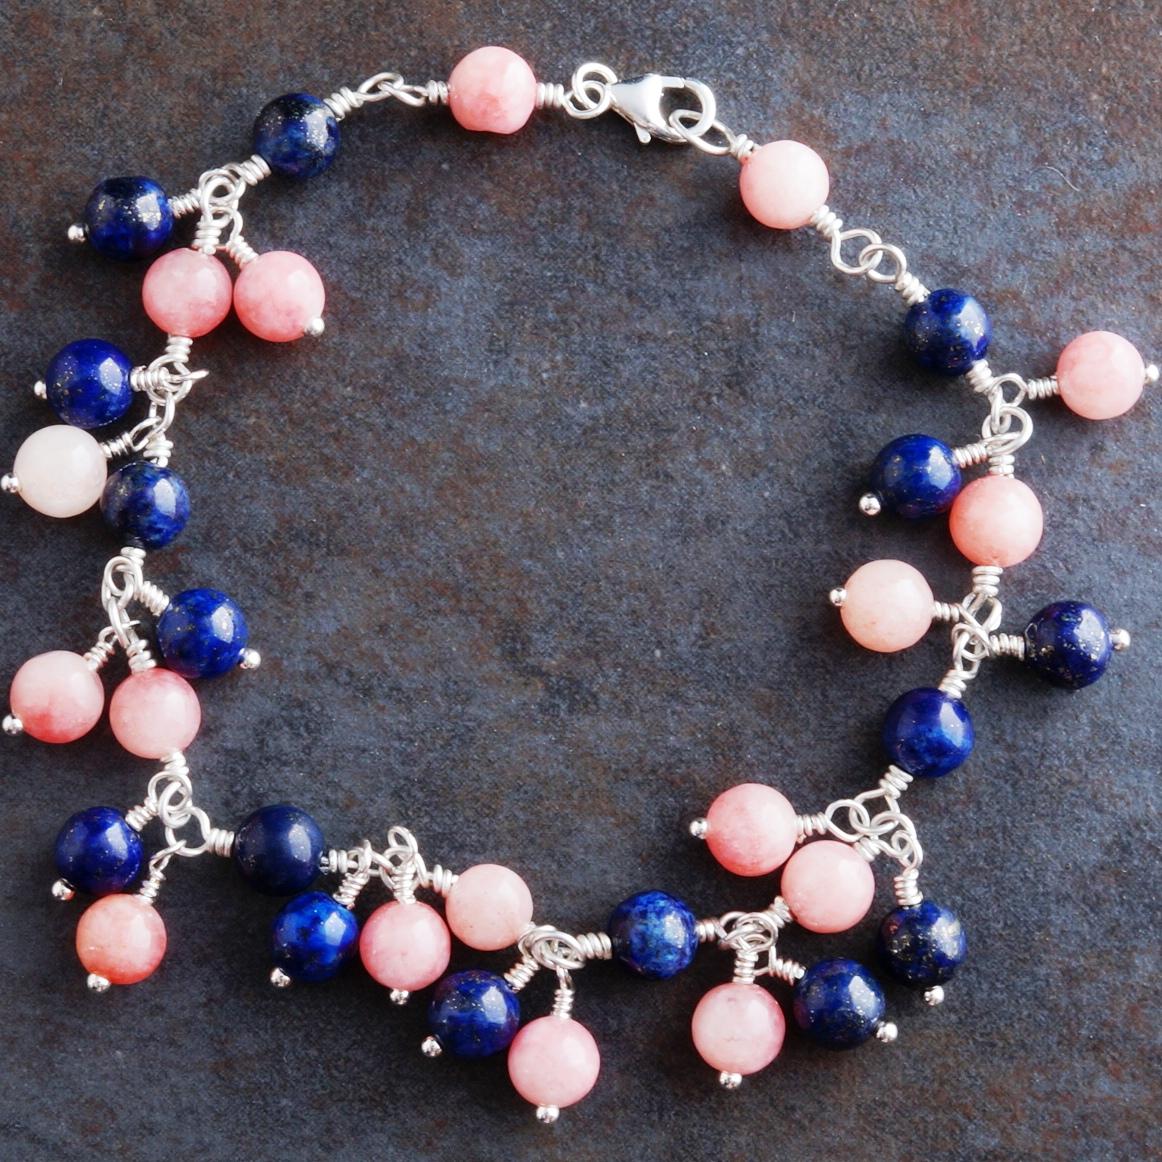 Handmade Sterling Silver Lapis Lazuli Rhodochrosite Charm Bracelet